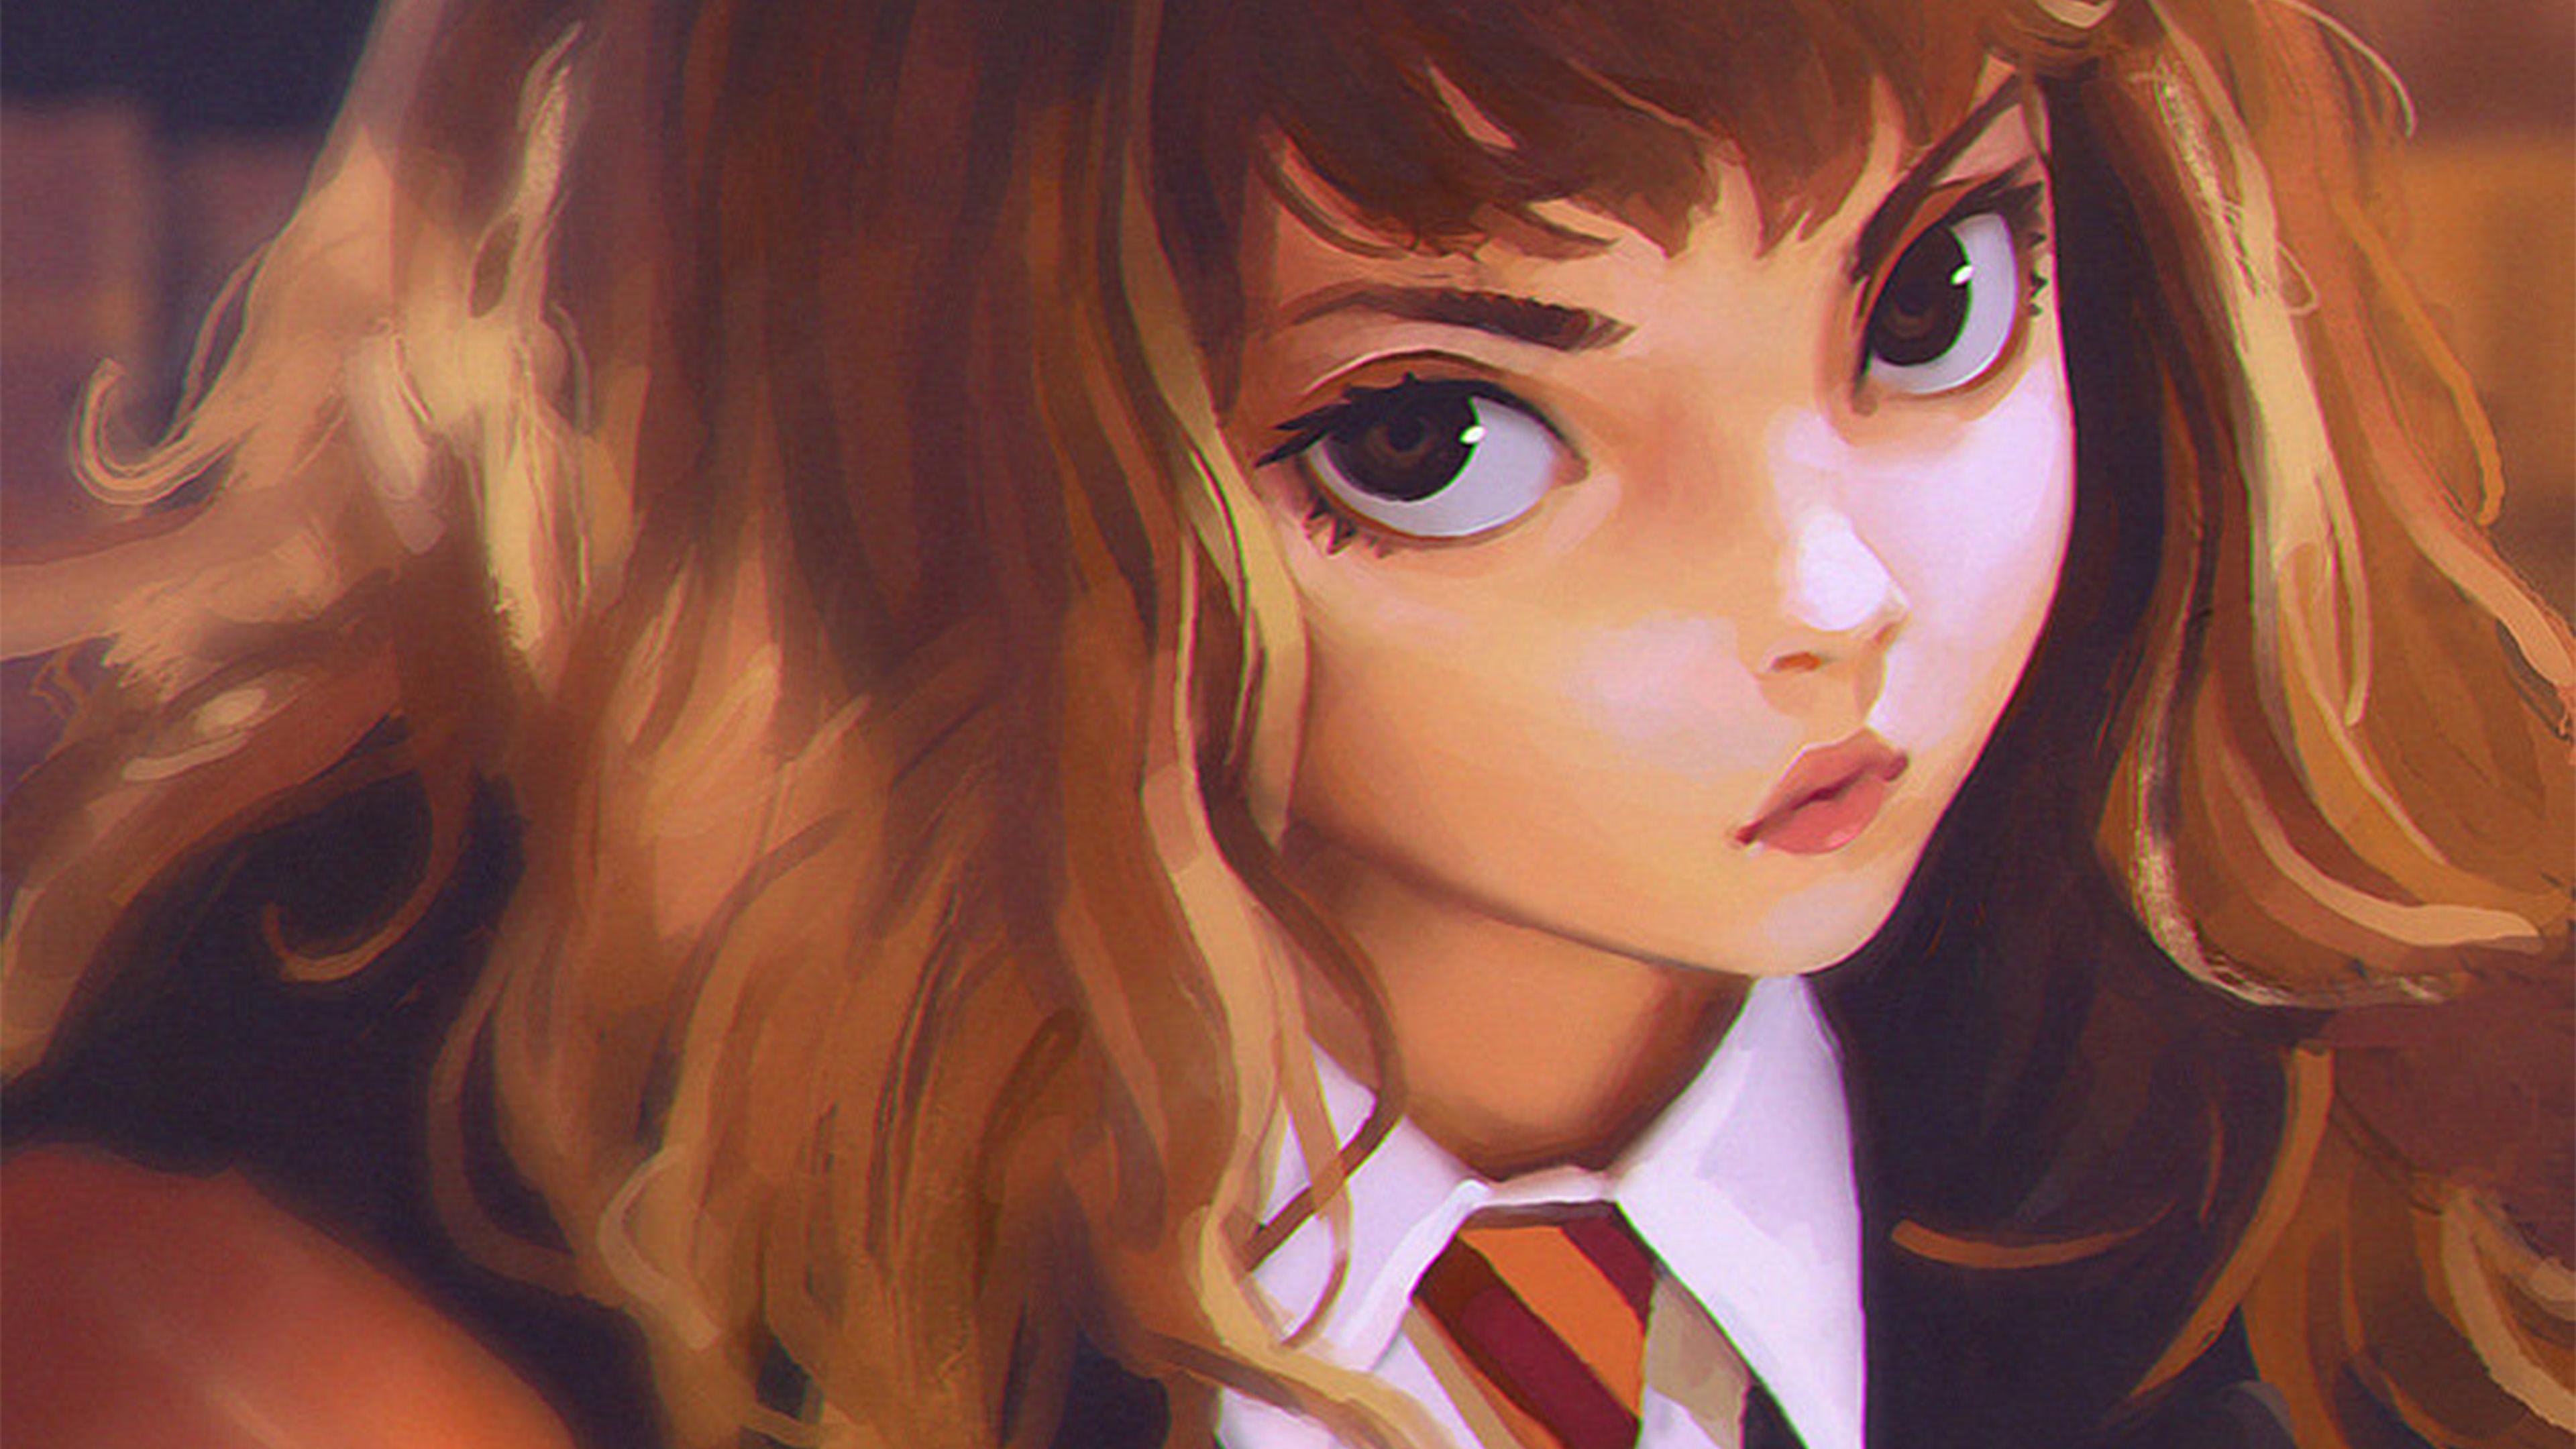 Amazing Wallpaper Harry Potter Imac - papers  Image_213287.jpg